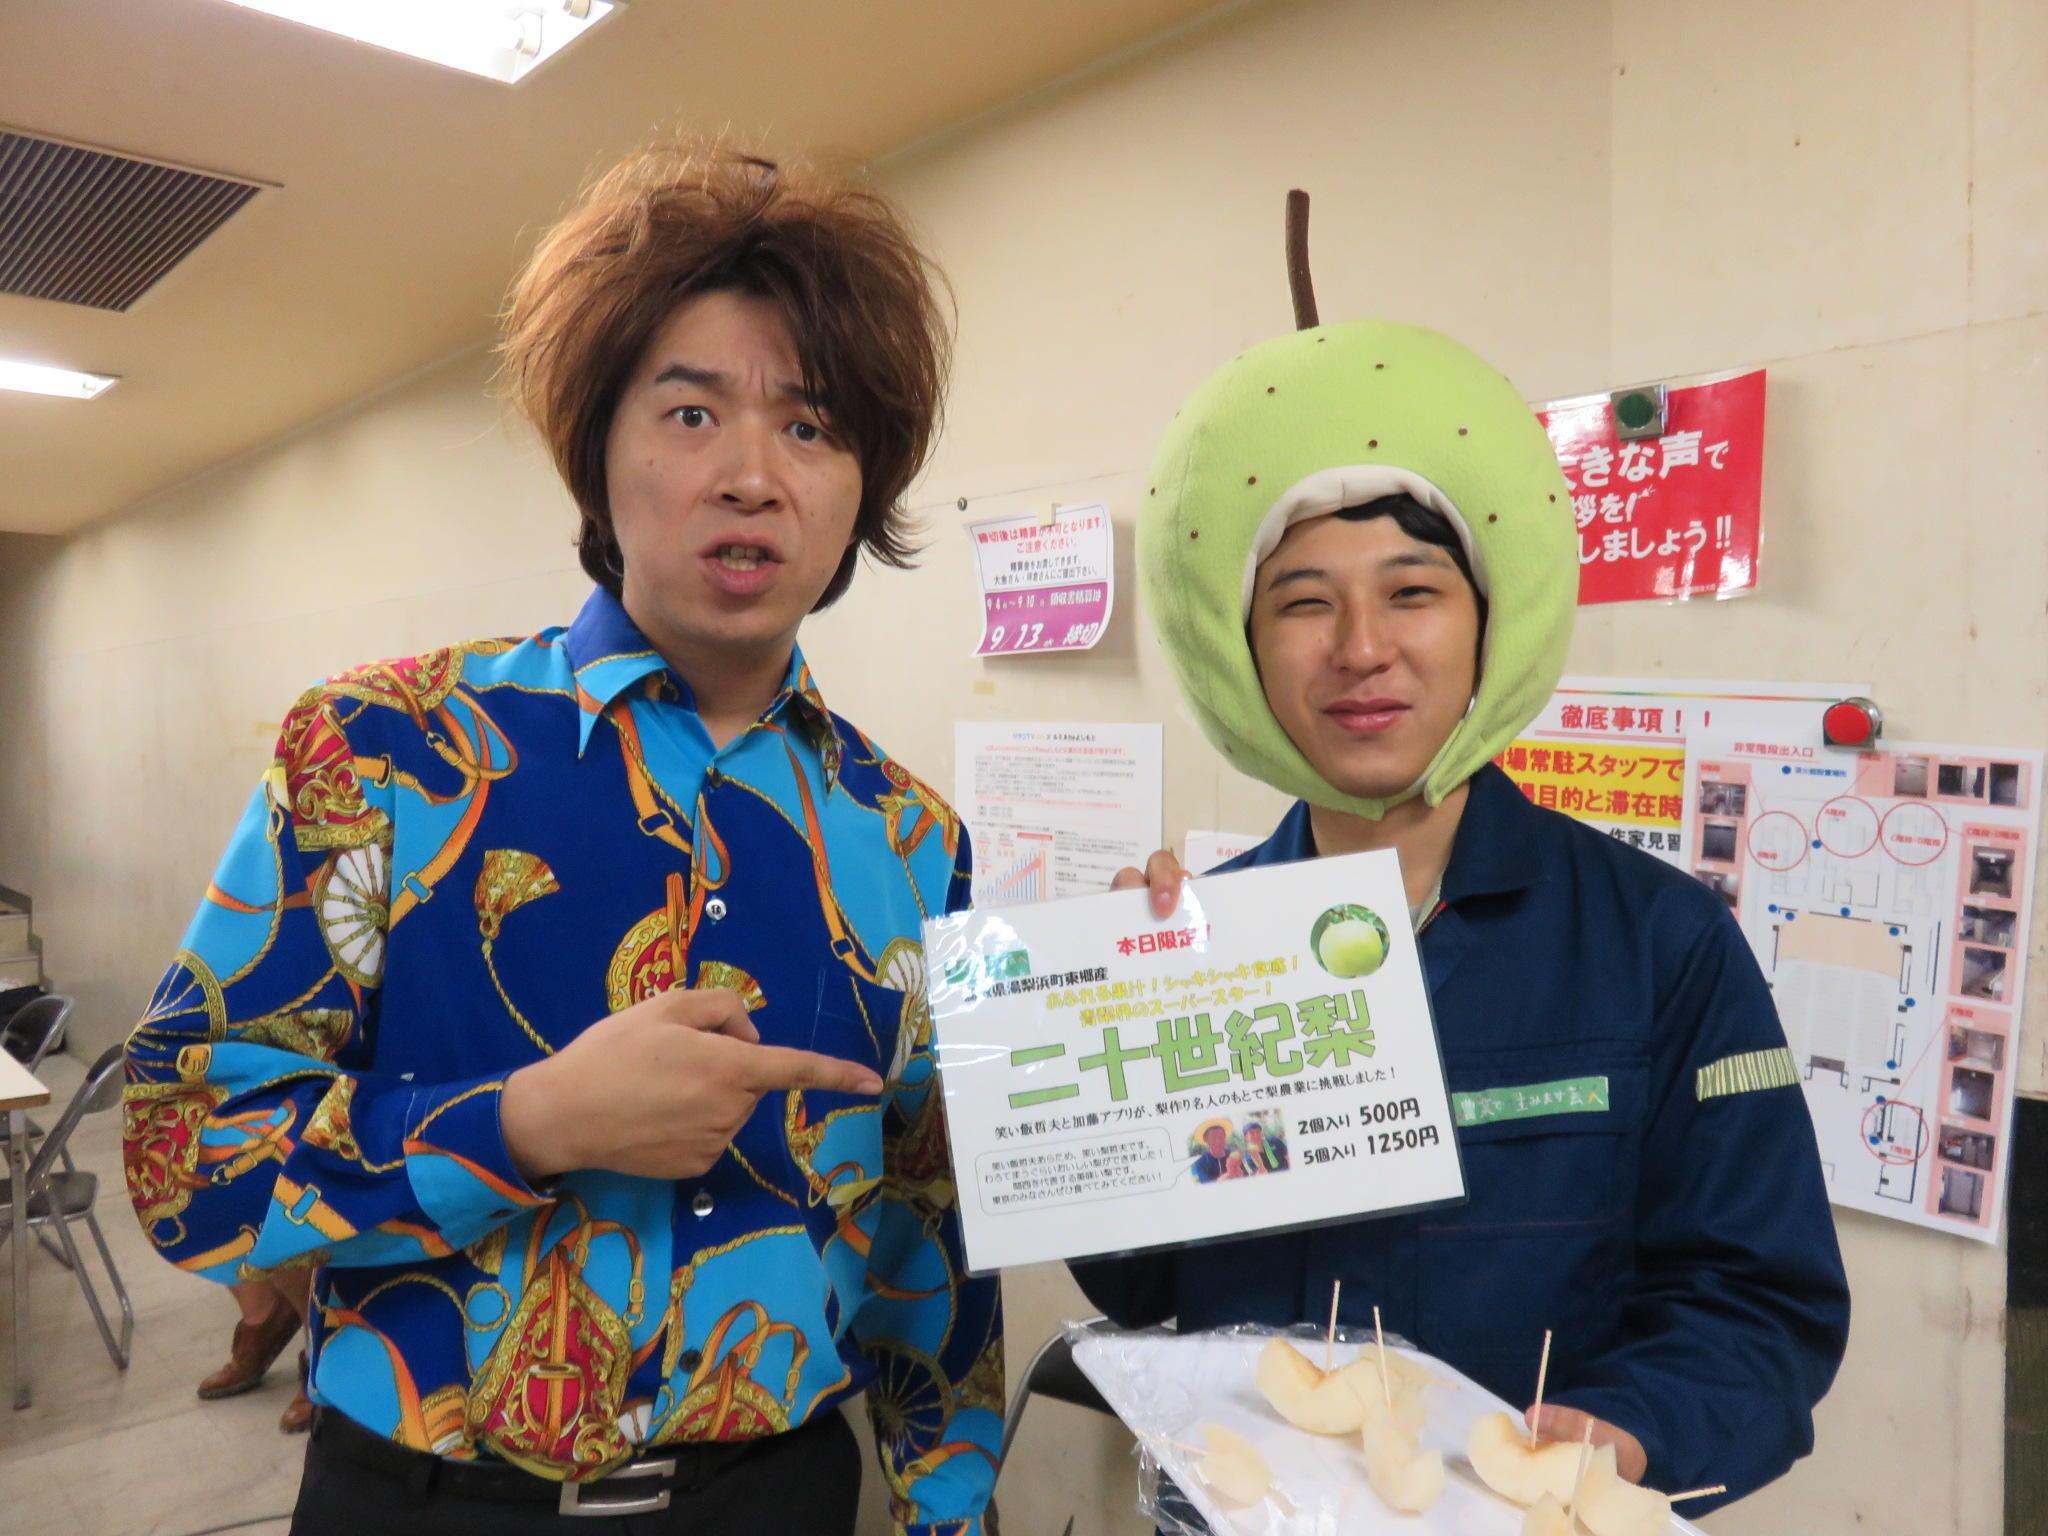 http://news.yoshimoto.co.jp/20170909015131-7bc599d2eaf56bf03dde9e78e129b28d3626afee.jpg